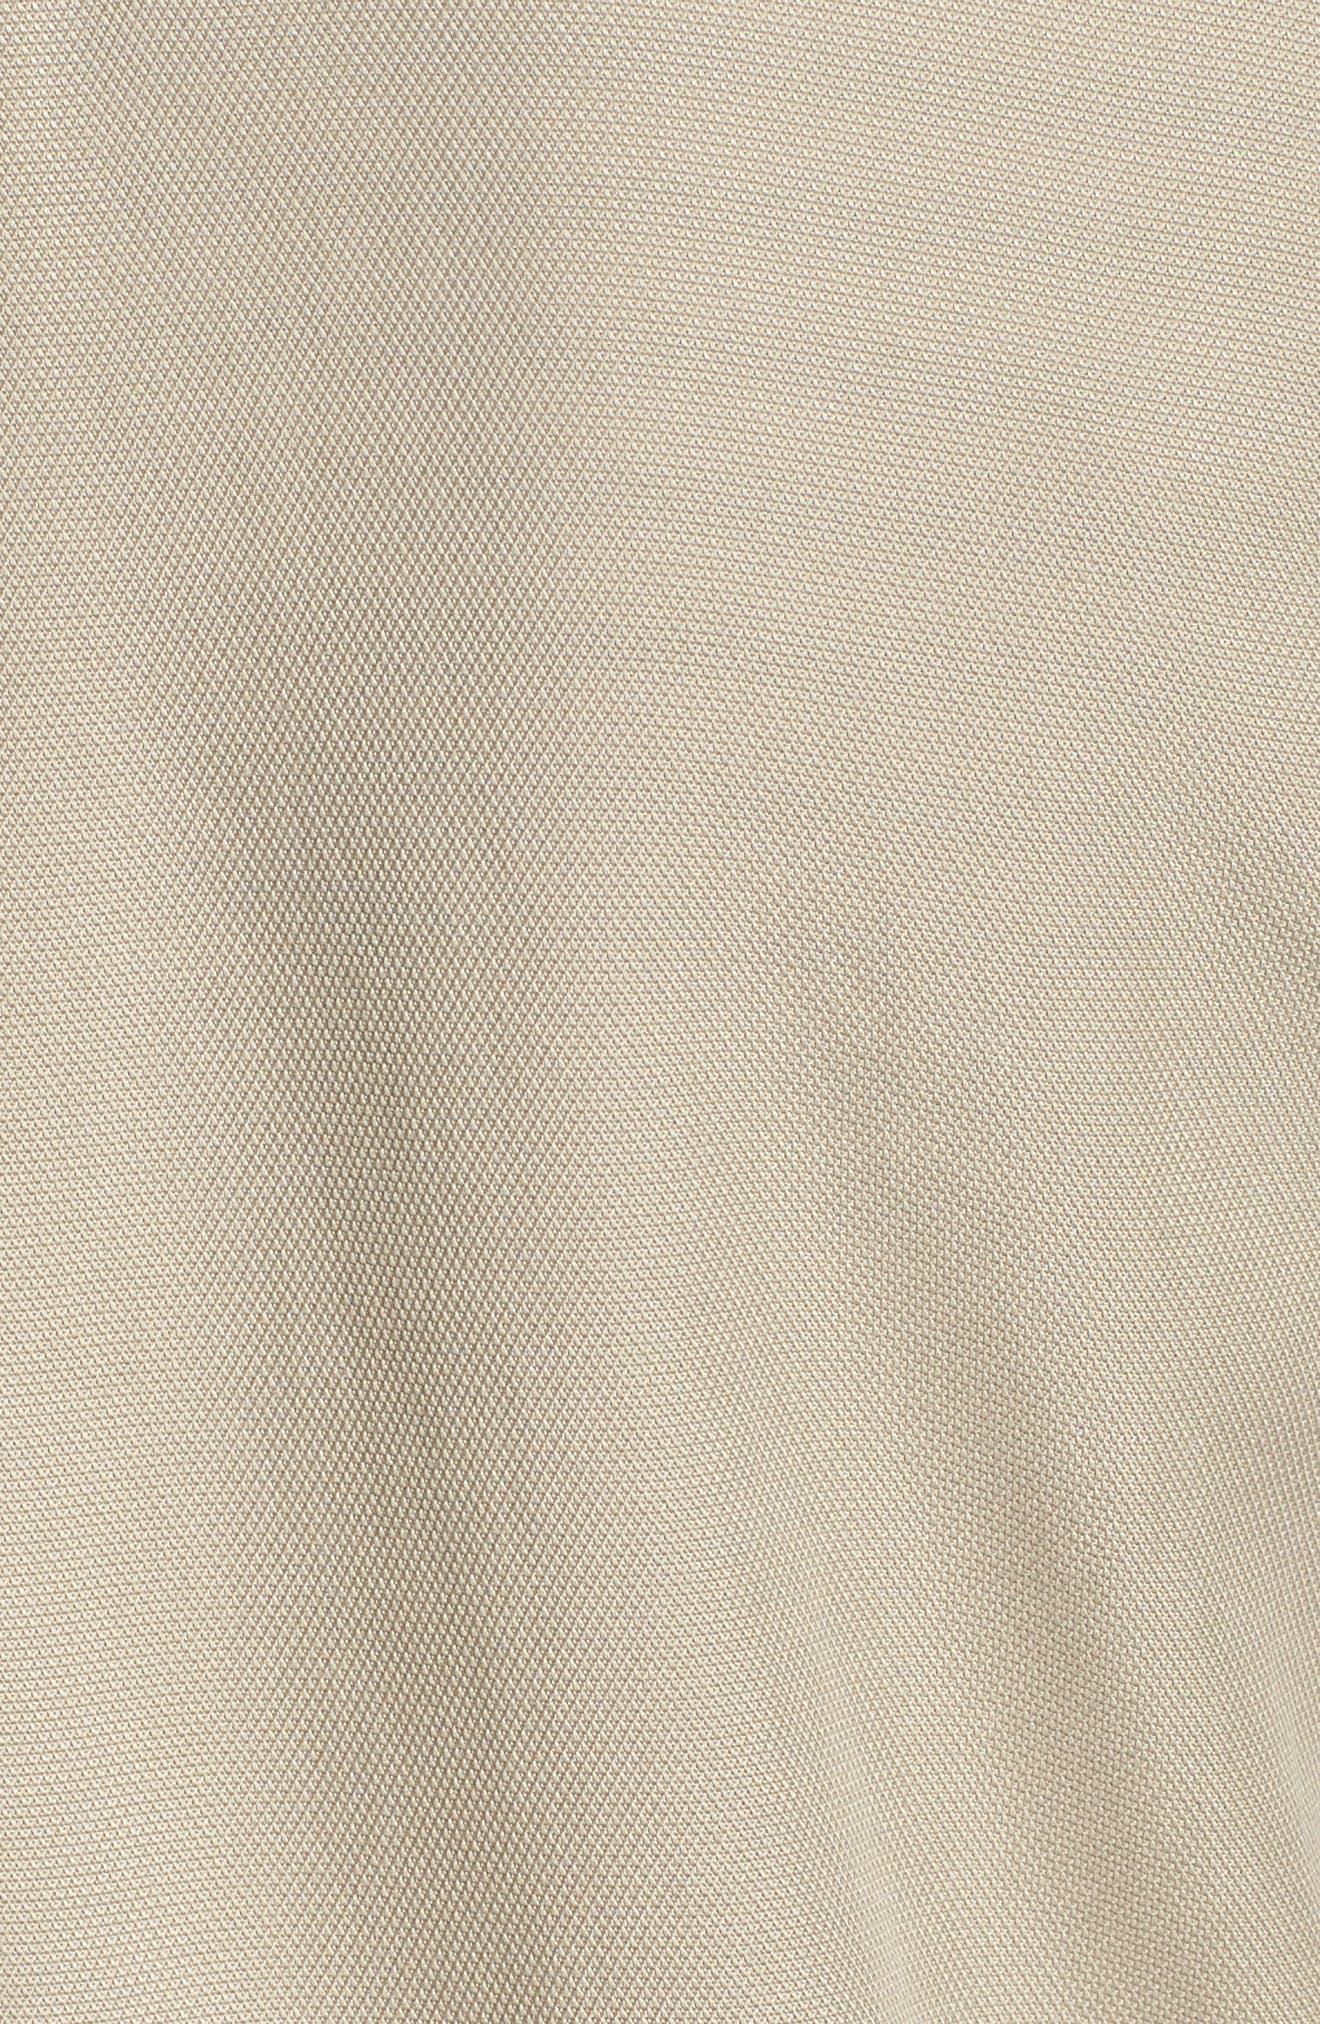 Flyaway Shirt Jacket,                             Alternate thumbnail 5, color,                             Chateau Gray